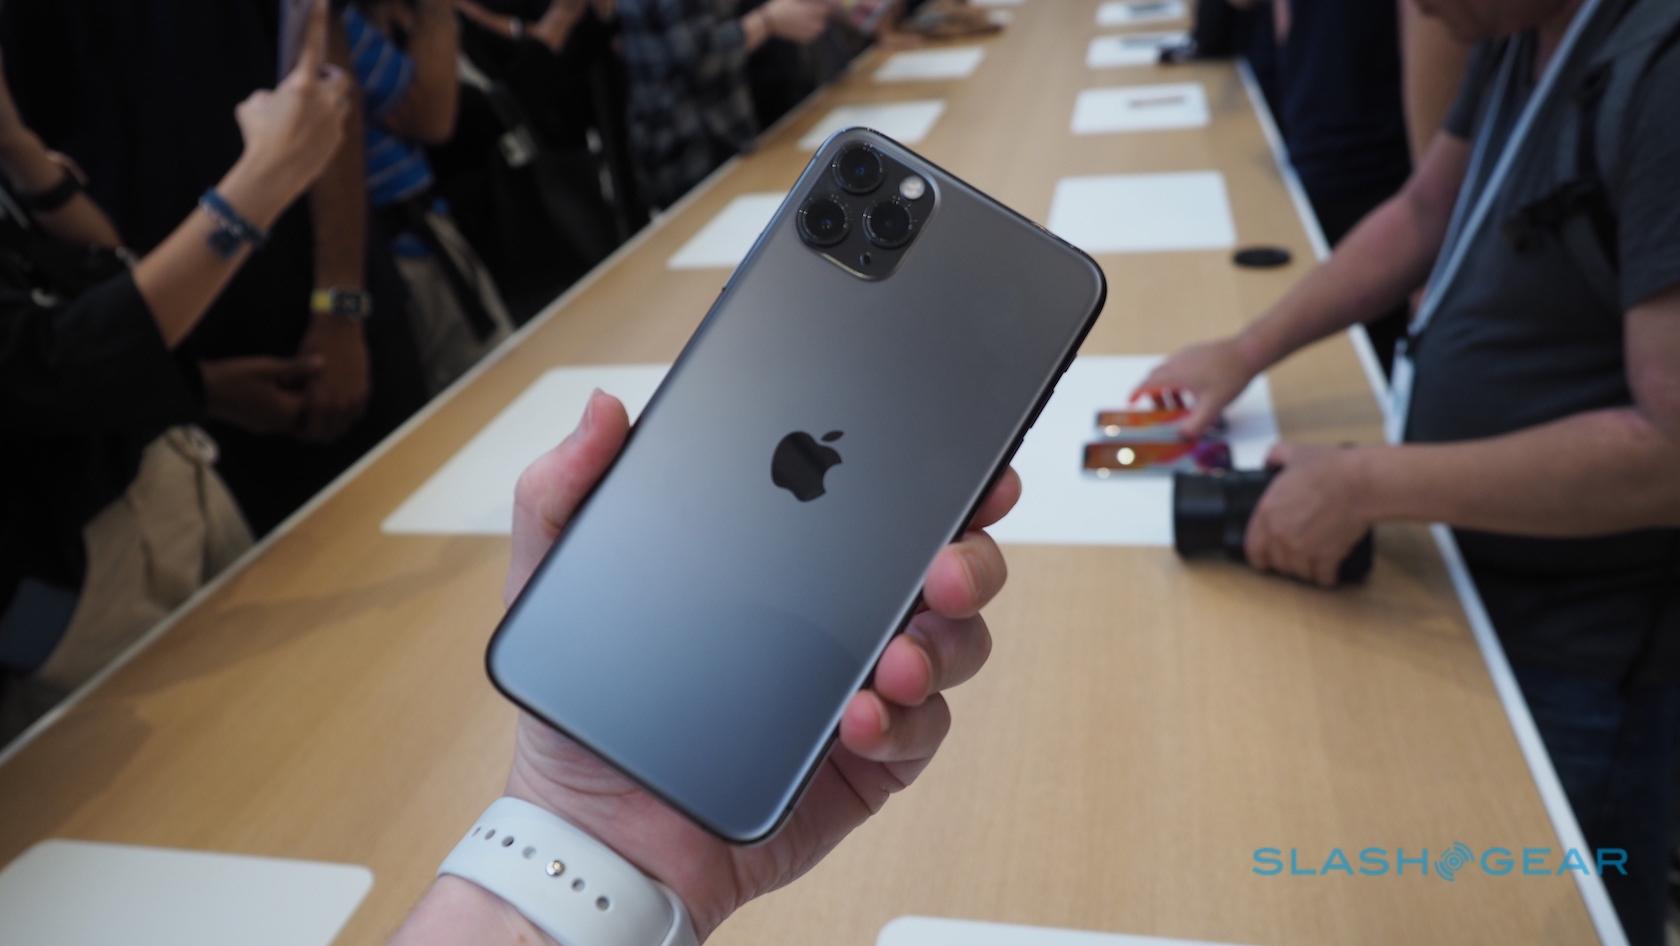 iPhone 11 Pro hands-on: That flagship feeling - SlashGear